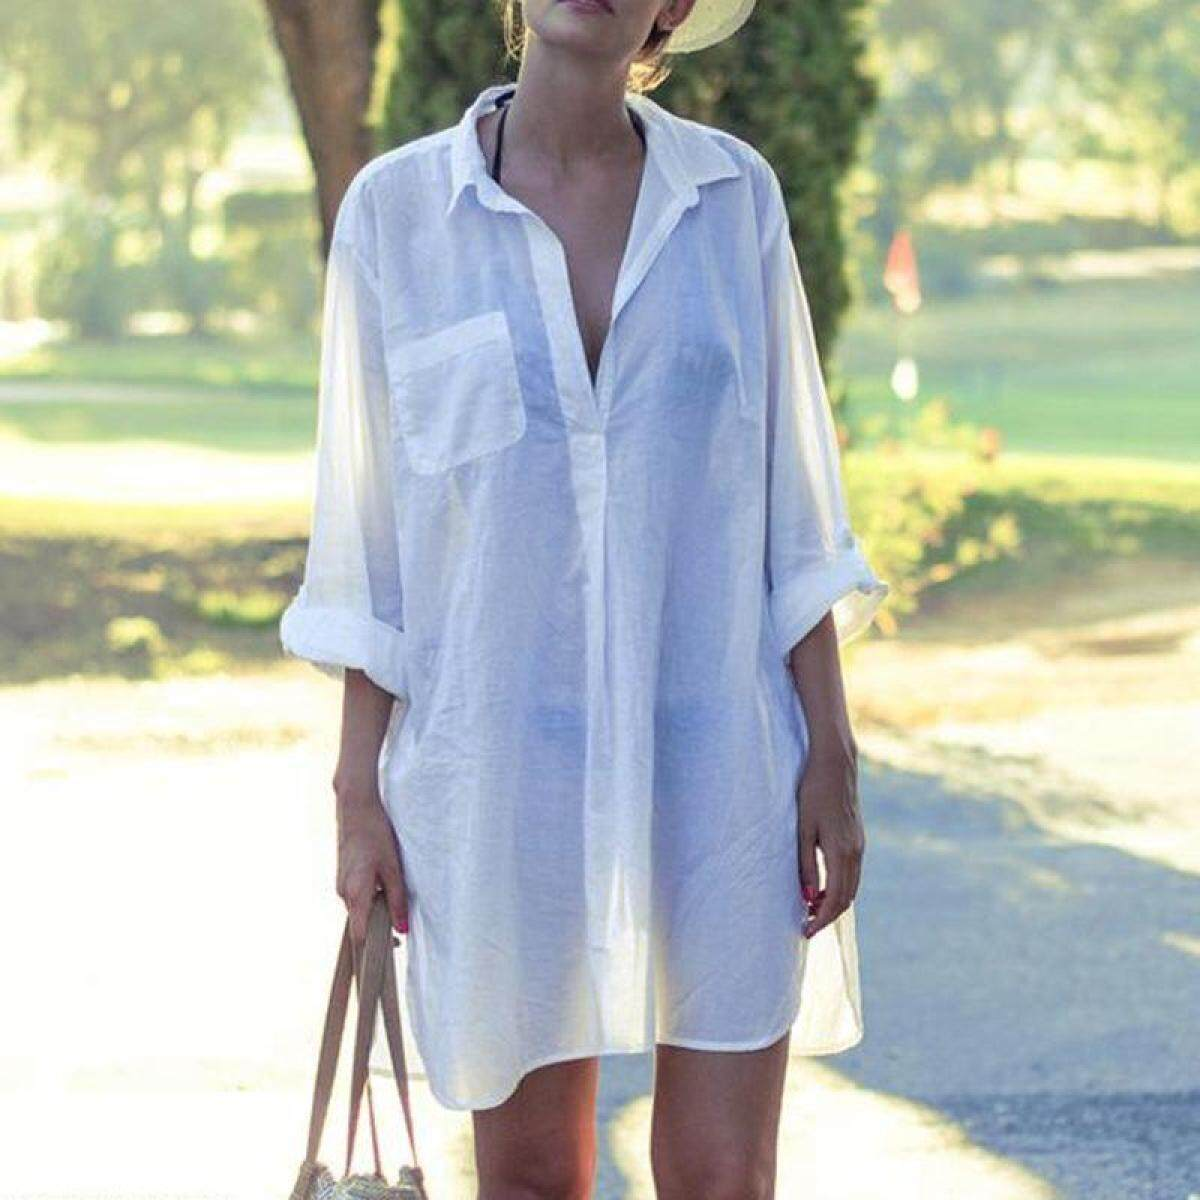 0050091954cb4 Saida De Praia Beach Dress Tunic Pareos For Women Kaftan 2018 New Cotton  Shirt Long Sleeve